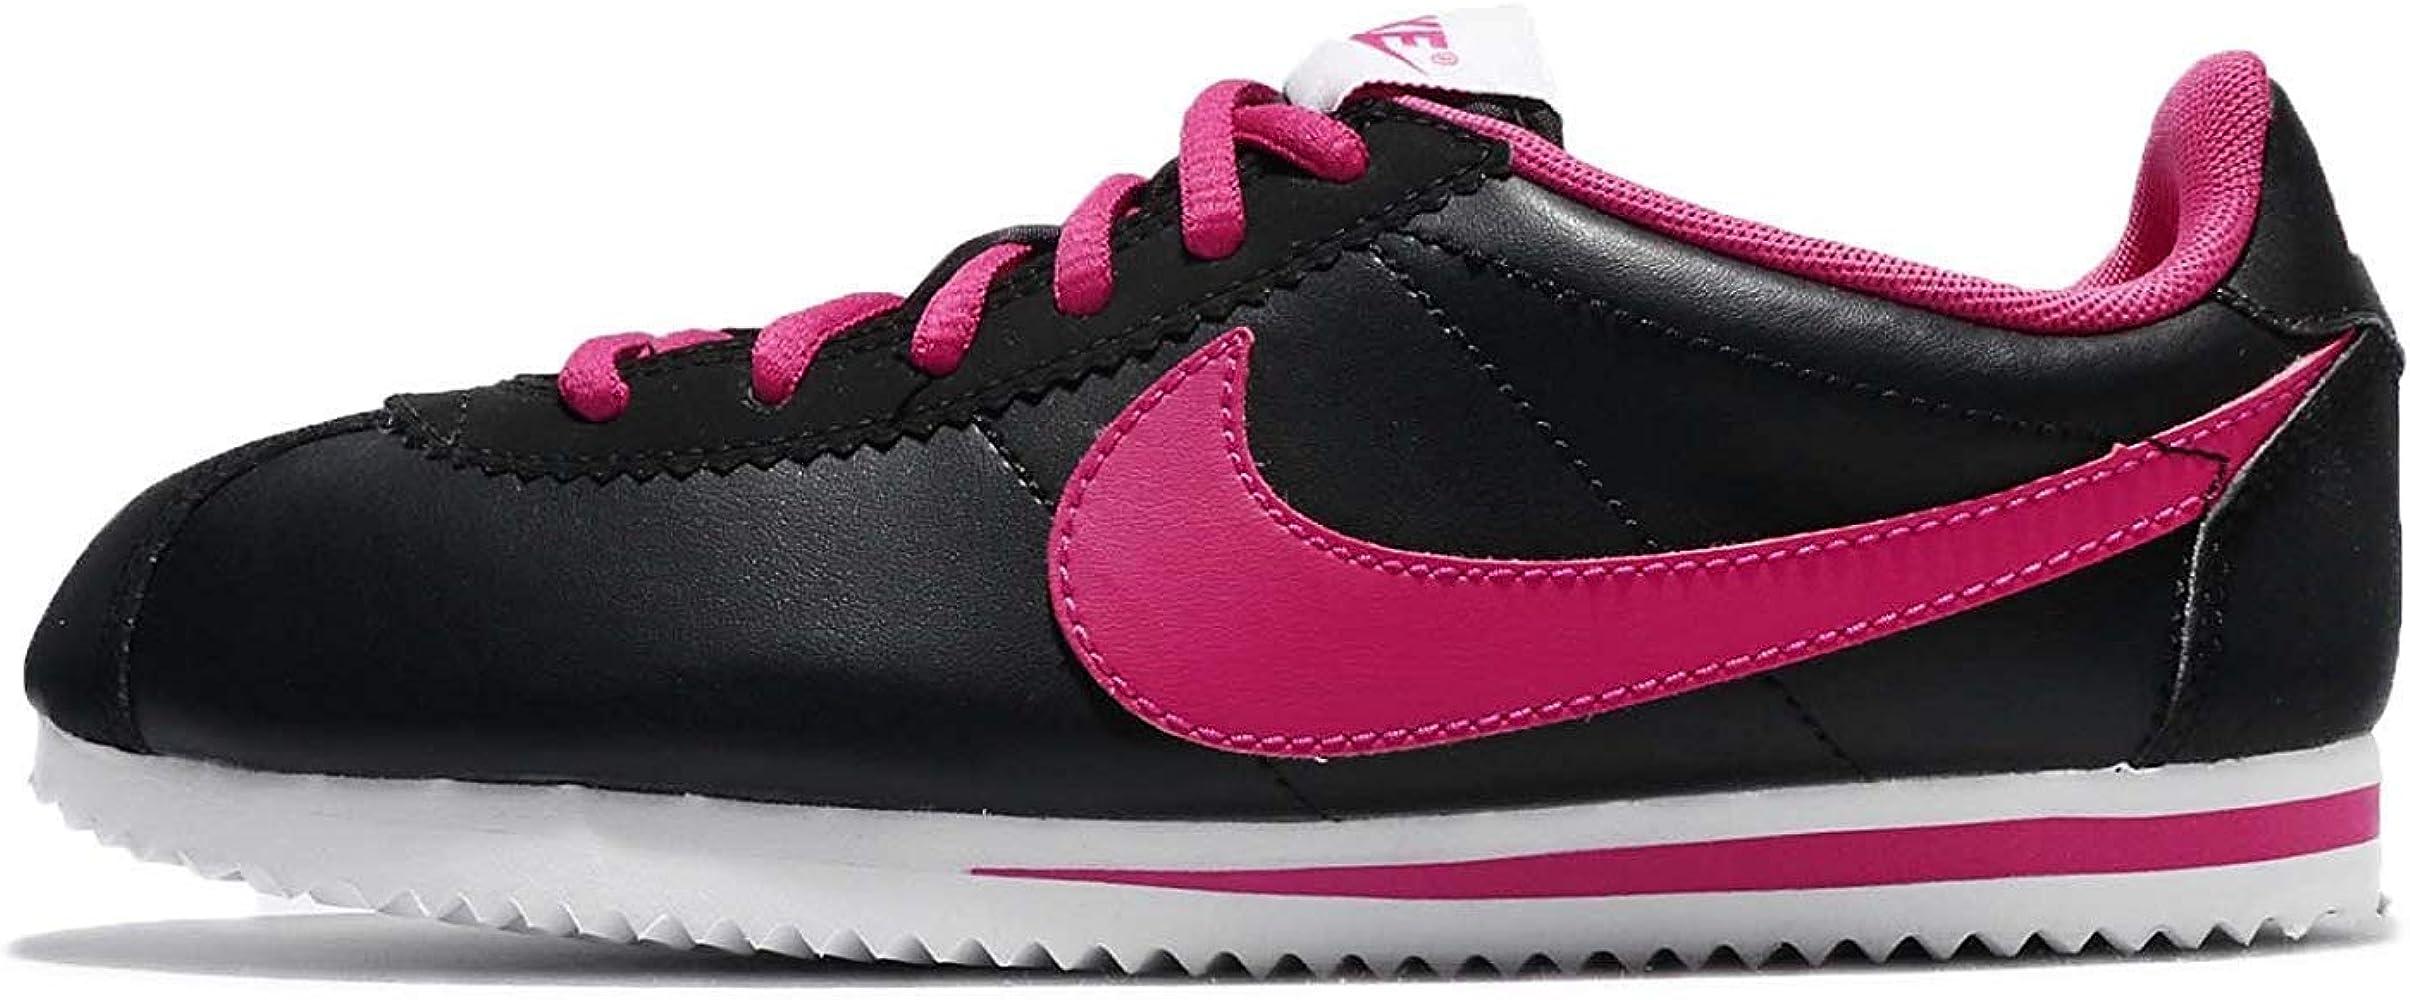 NIKE CORTEZ youth girls fashion sneaker